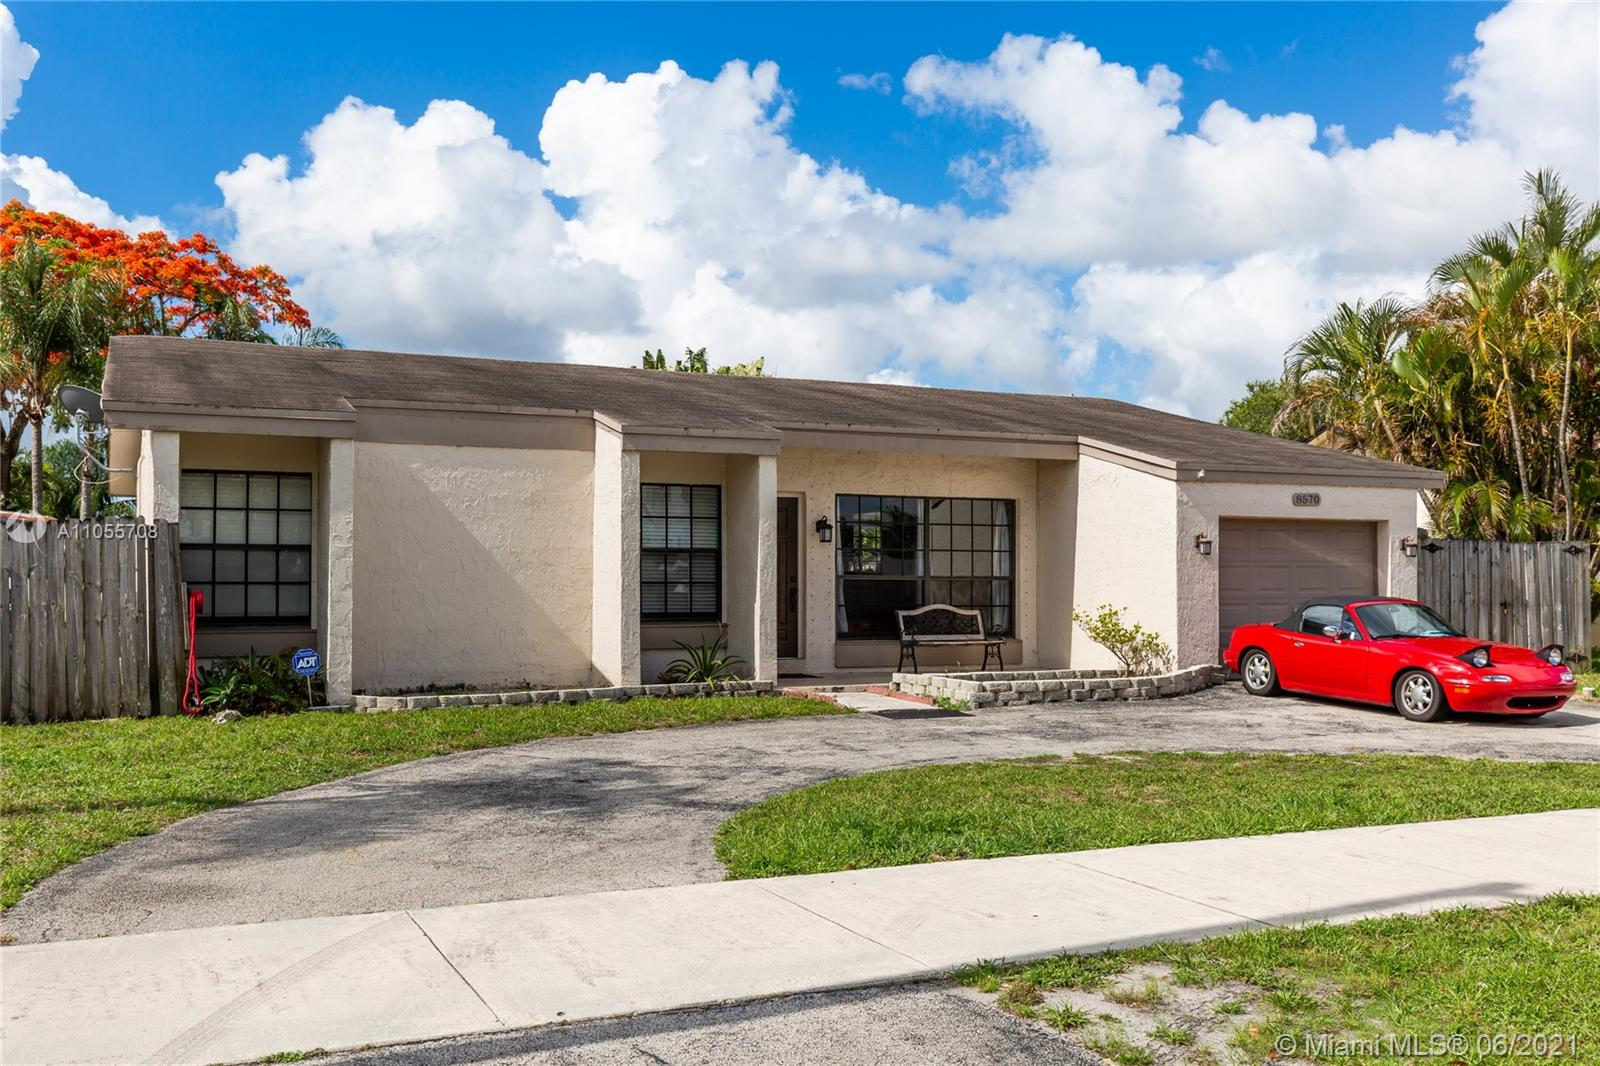 Boulevard Heights - 8570 Johnson St, Pembroke Pines, FL 33024